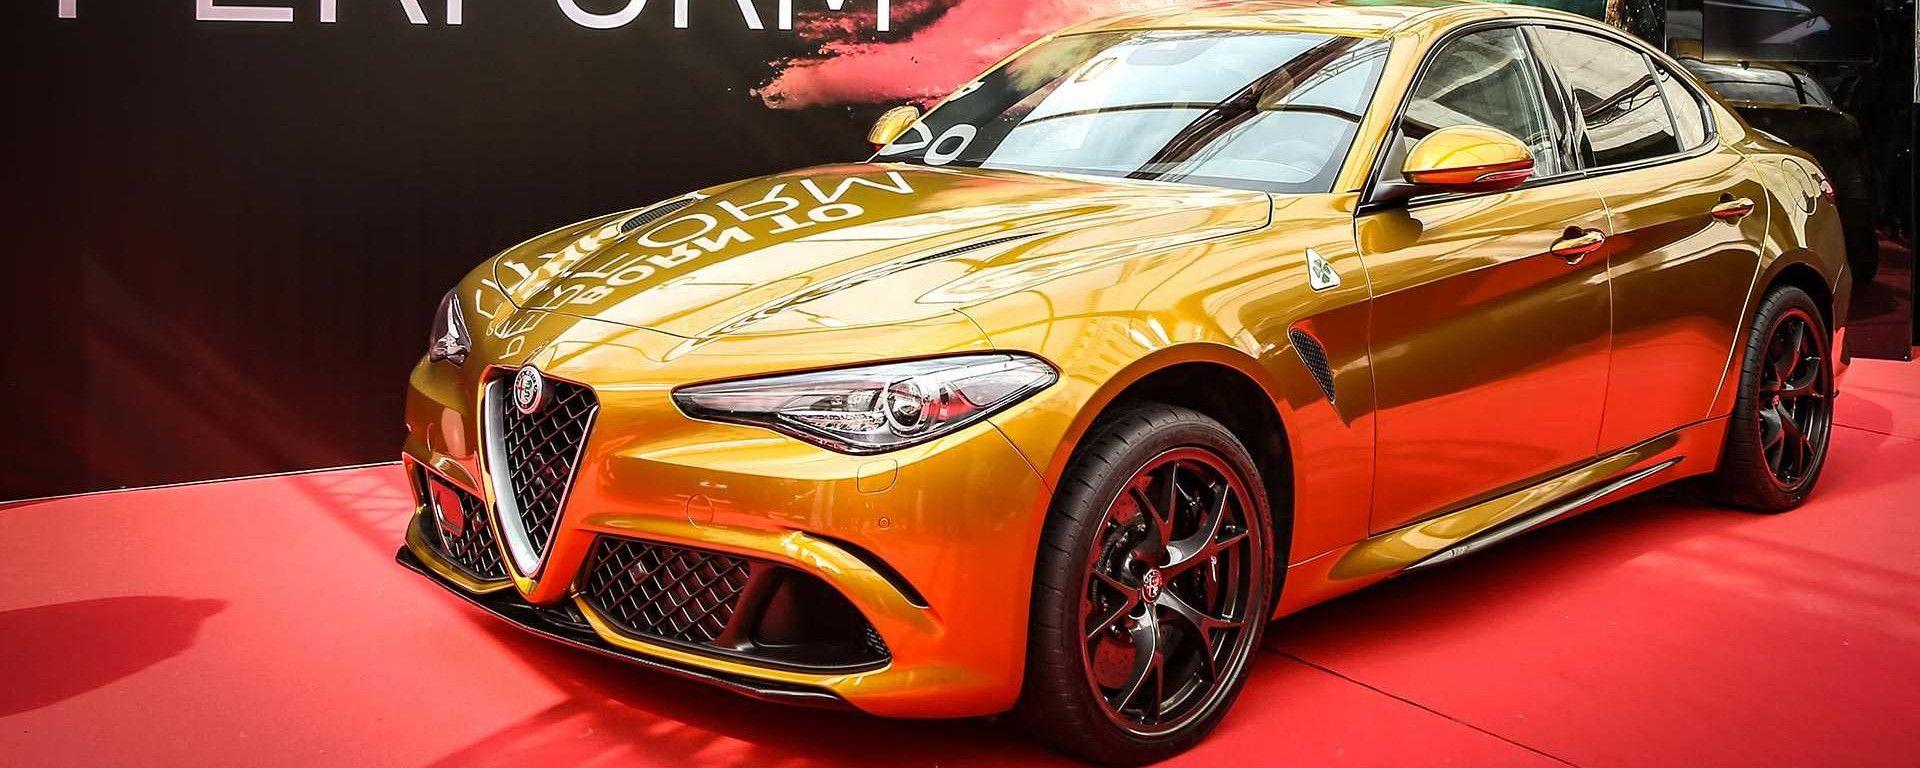 Alfa Romeo Giulia Quadrifoglio Gold